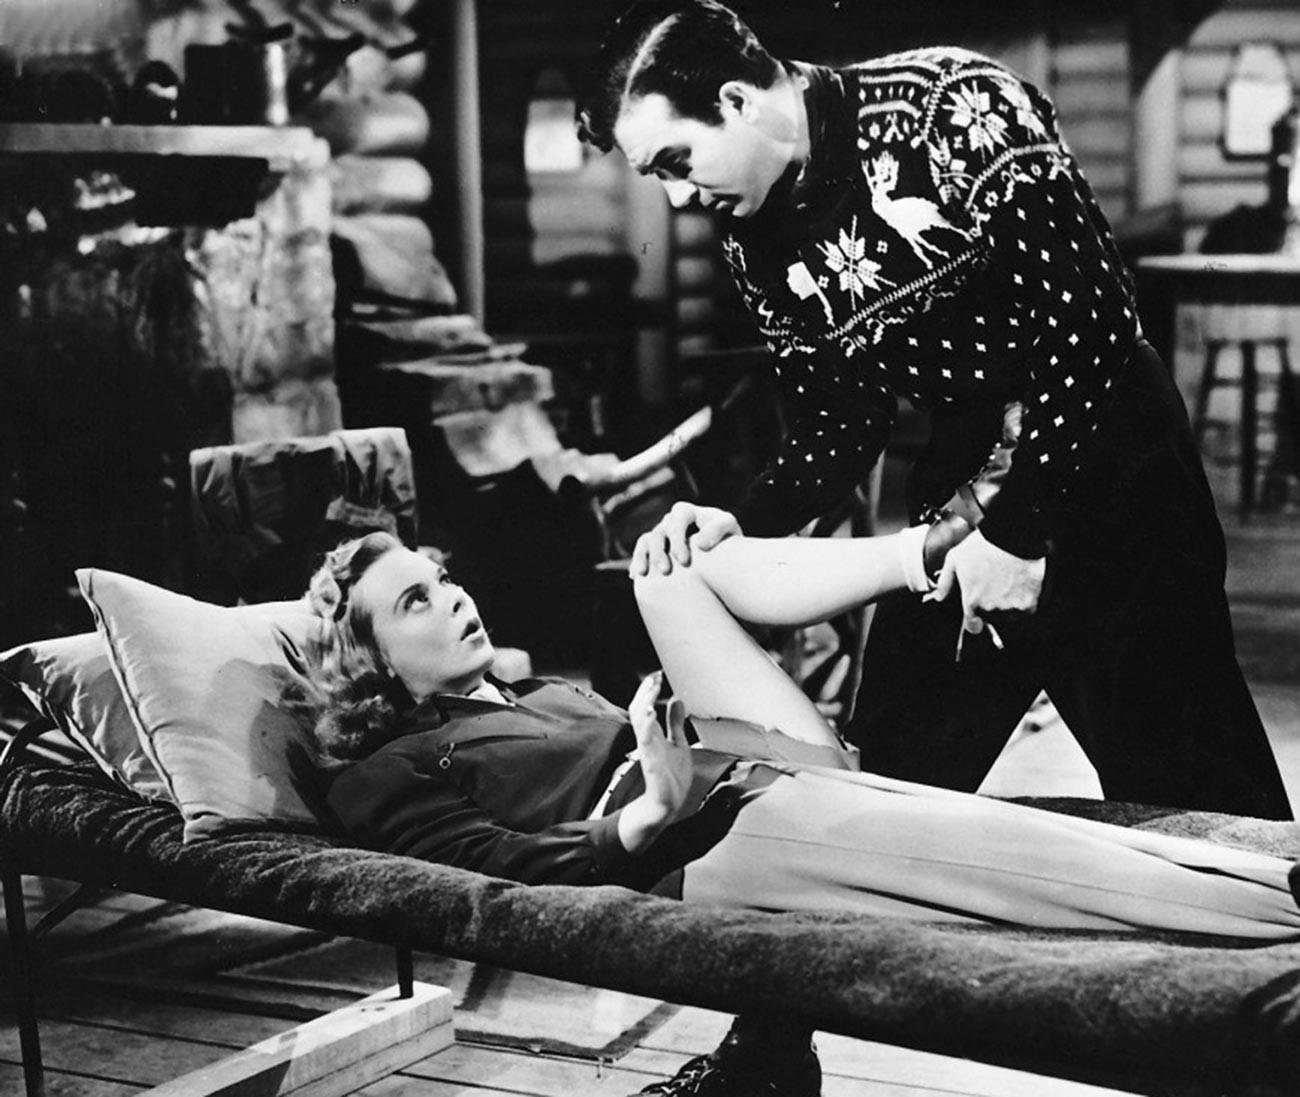 Prizor iz filma